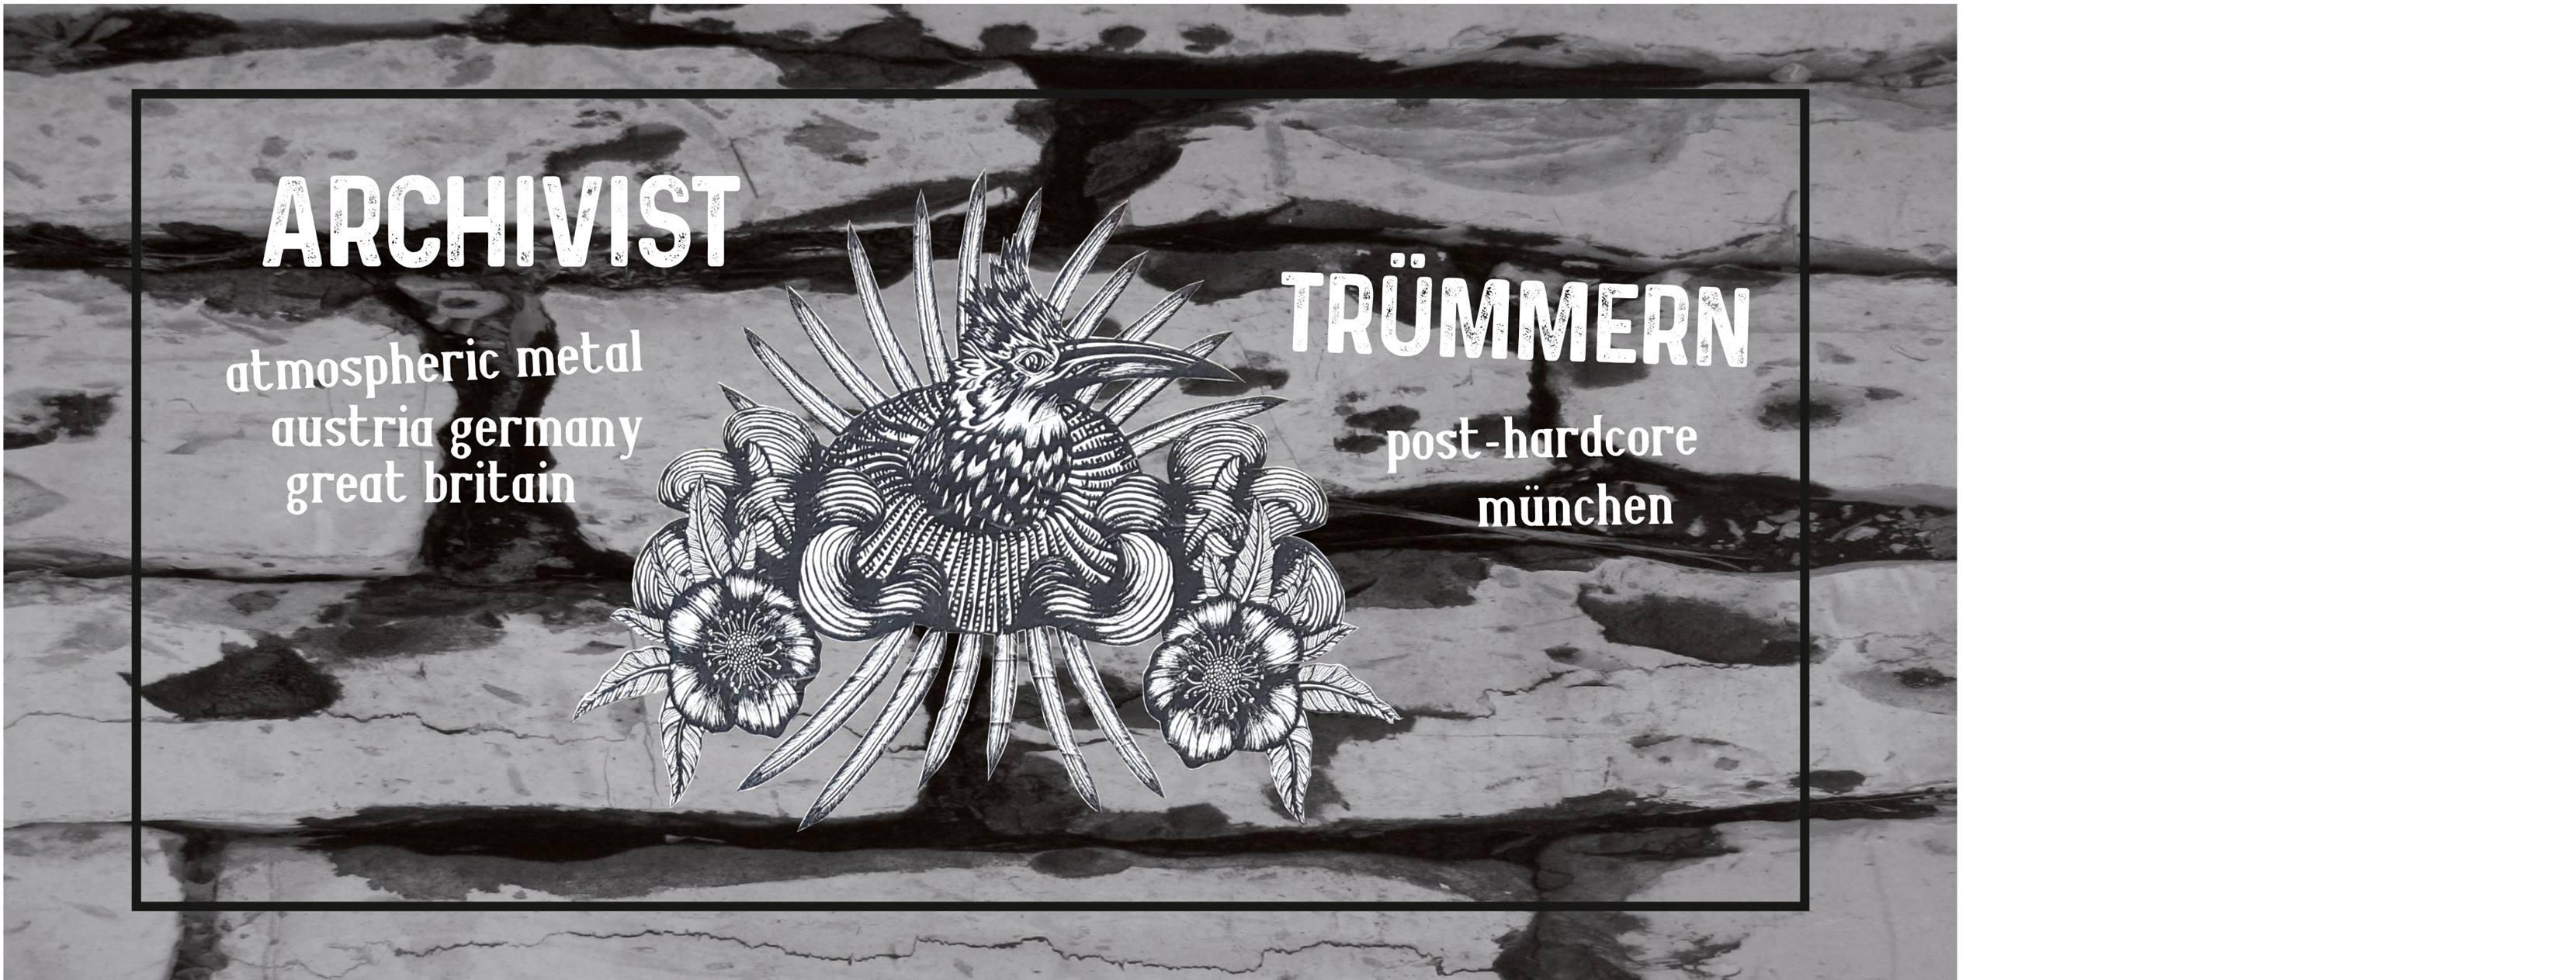 Archivist + Trümmern